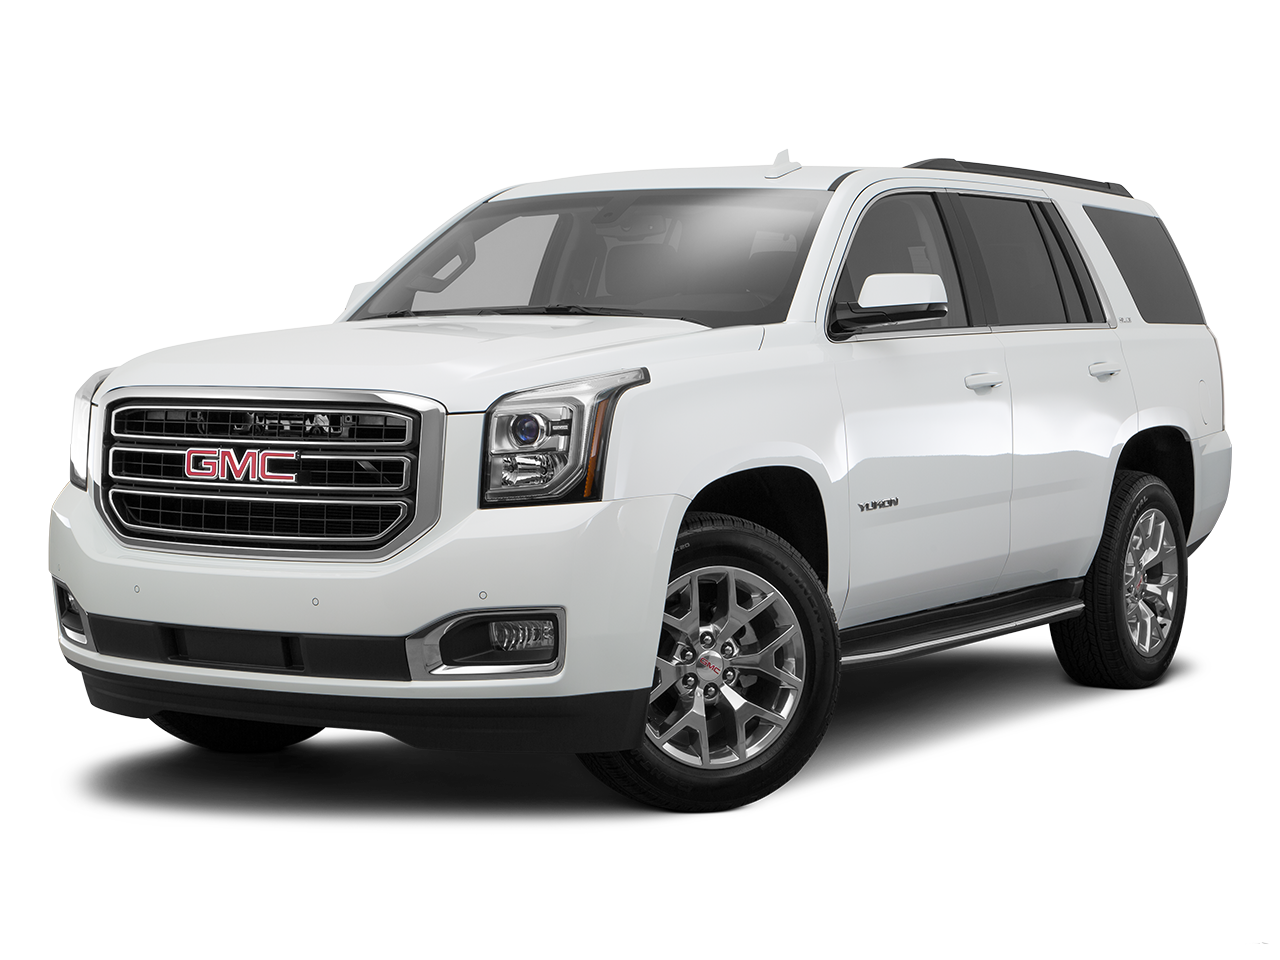 new s dealer iddn cadillac nation cash gmc e truck winnipeg static gauthier buick ca line extended dealership eng multi used lb trucknationextended ret